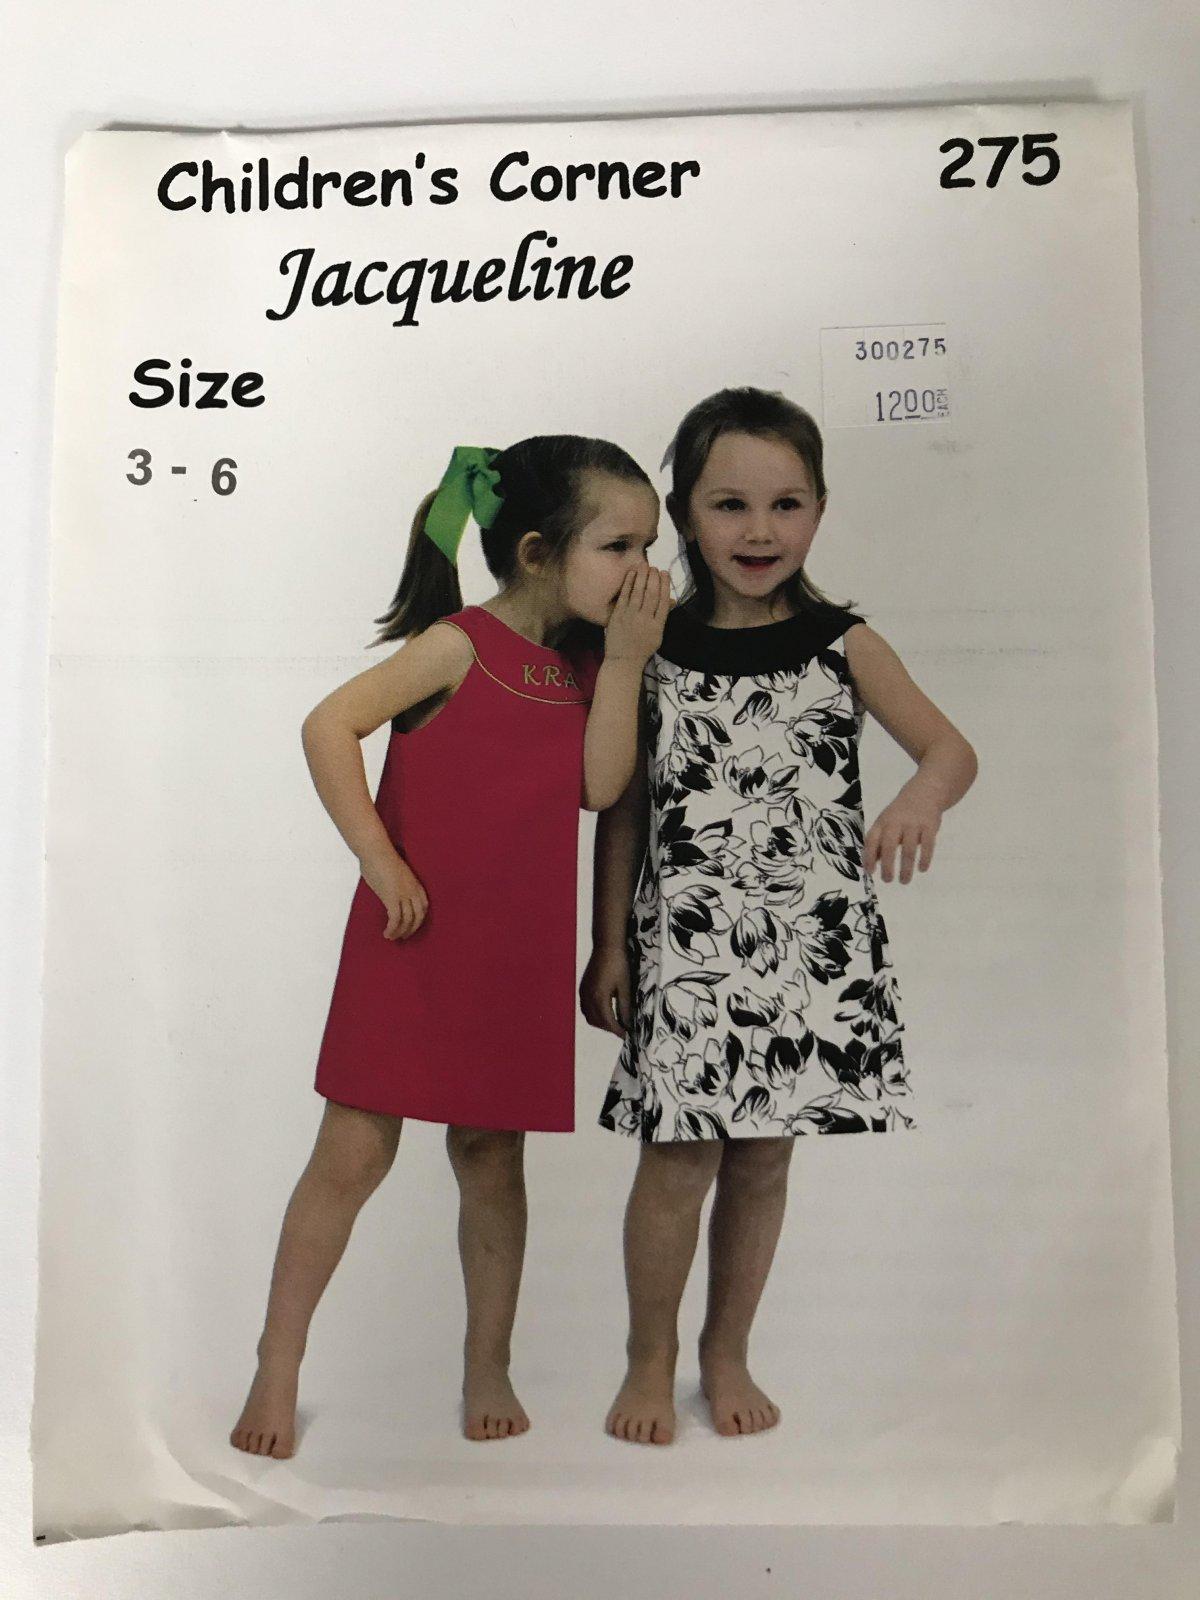 CHILDREN'S CORNER JAQUELINE